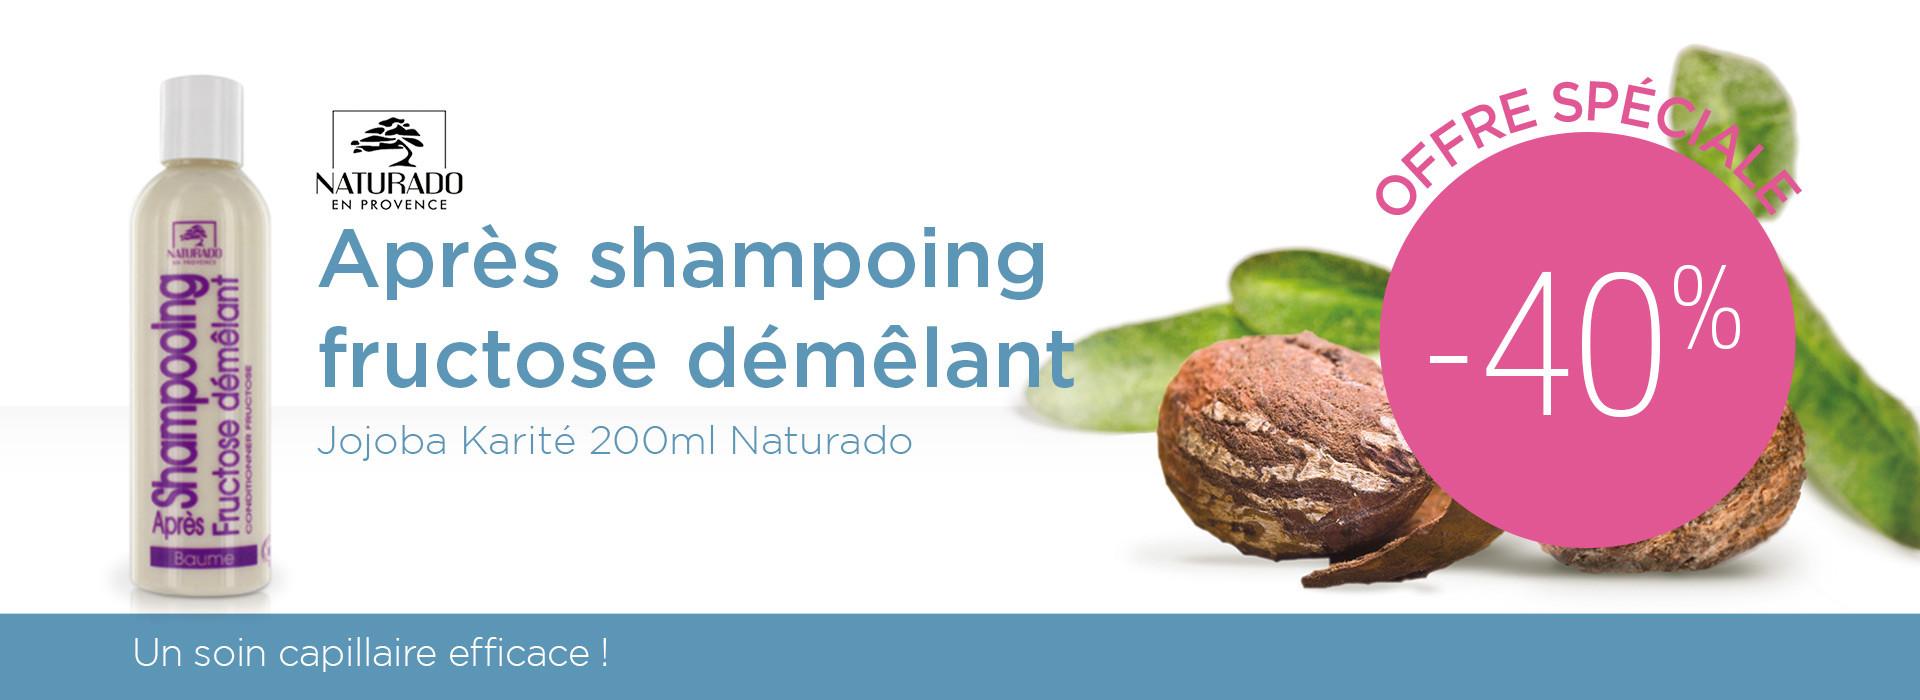 Après shampoing fructose démêlant Jojoba Karité Naturado à -40%